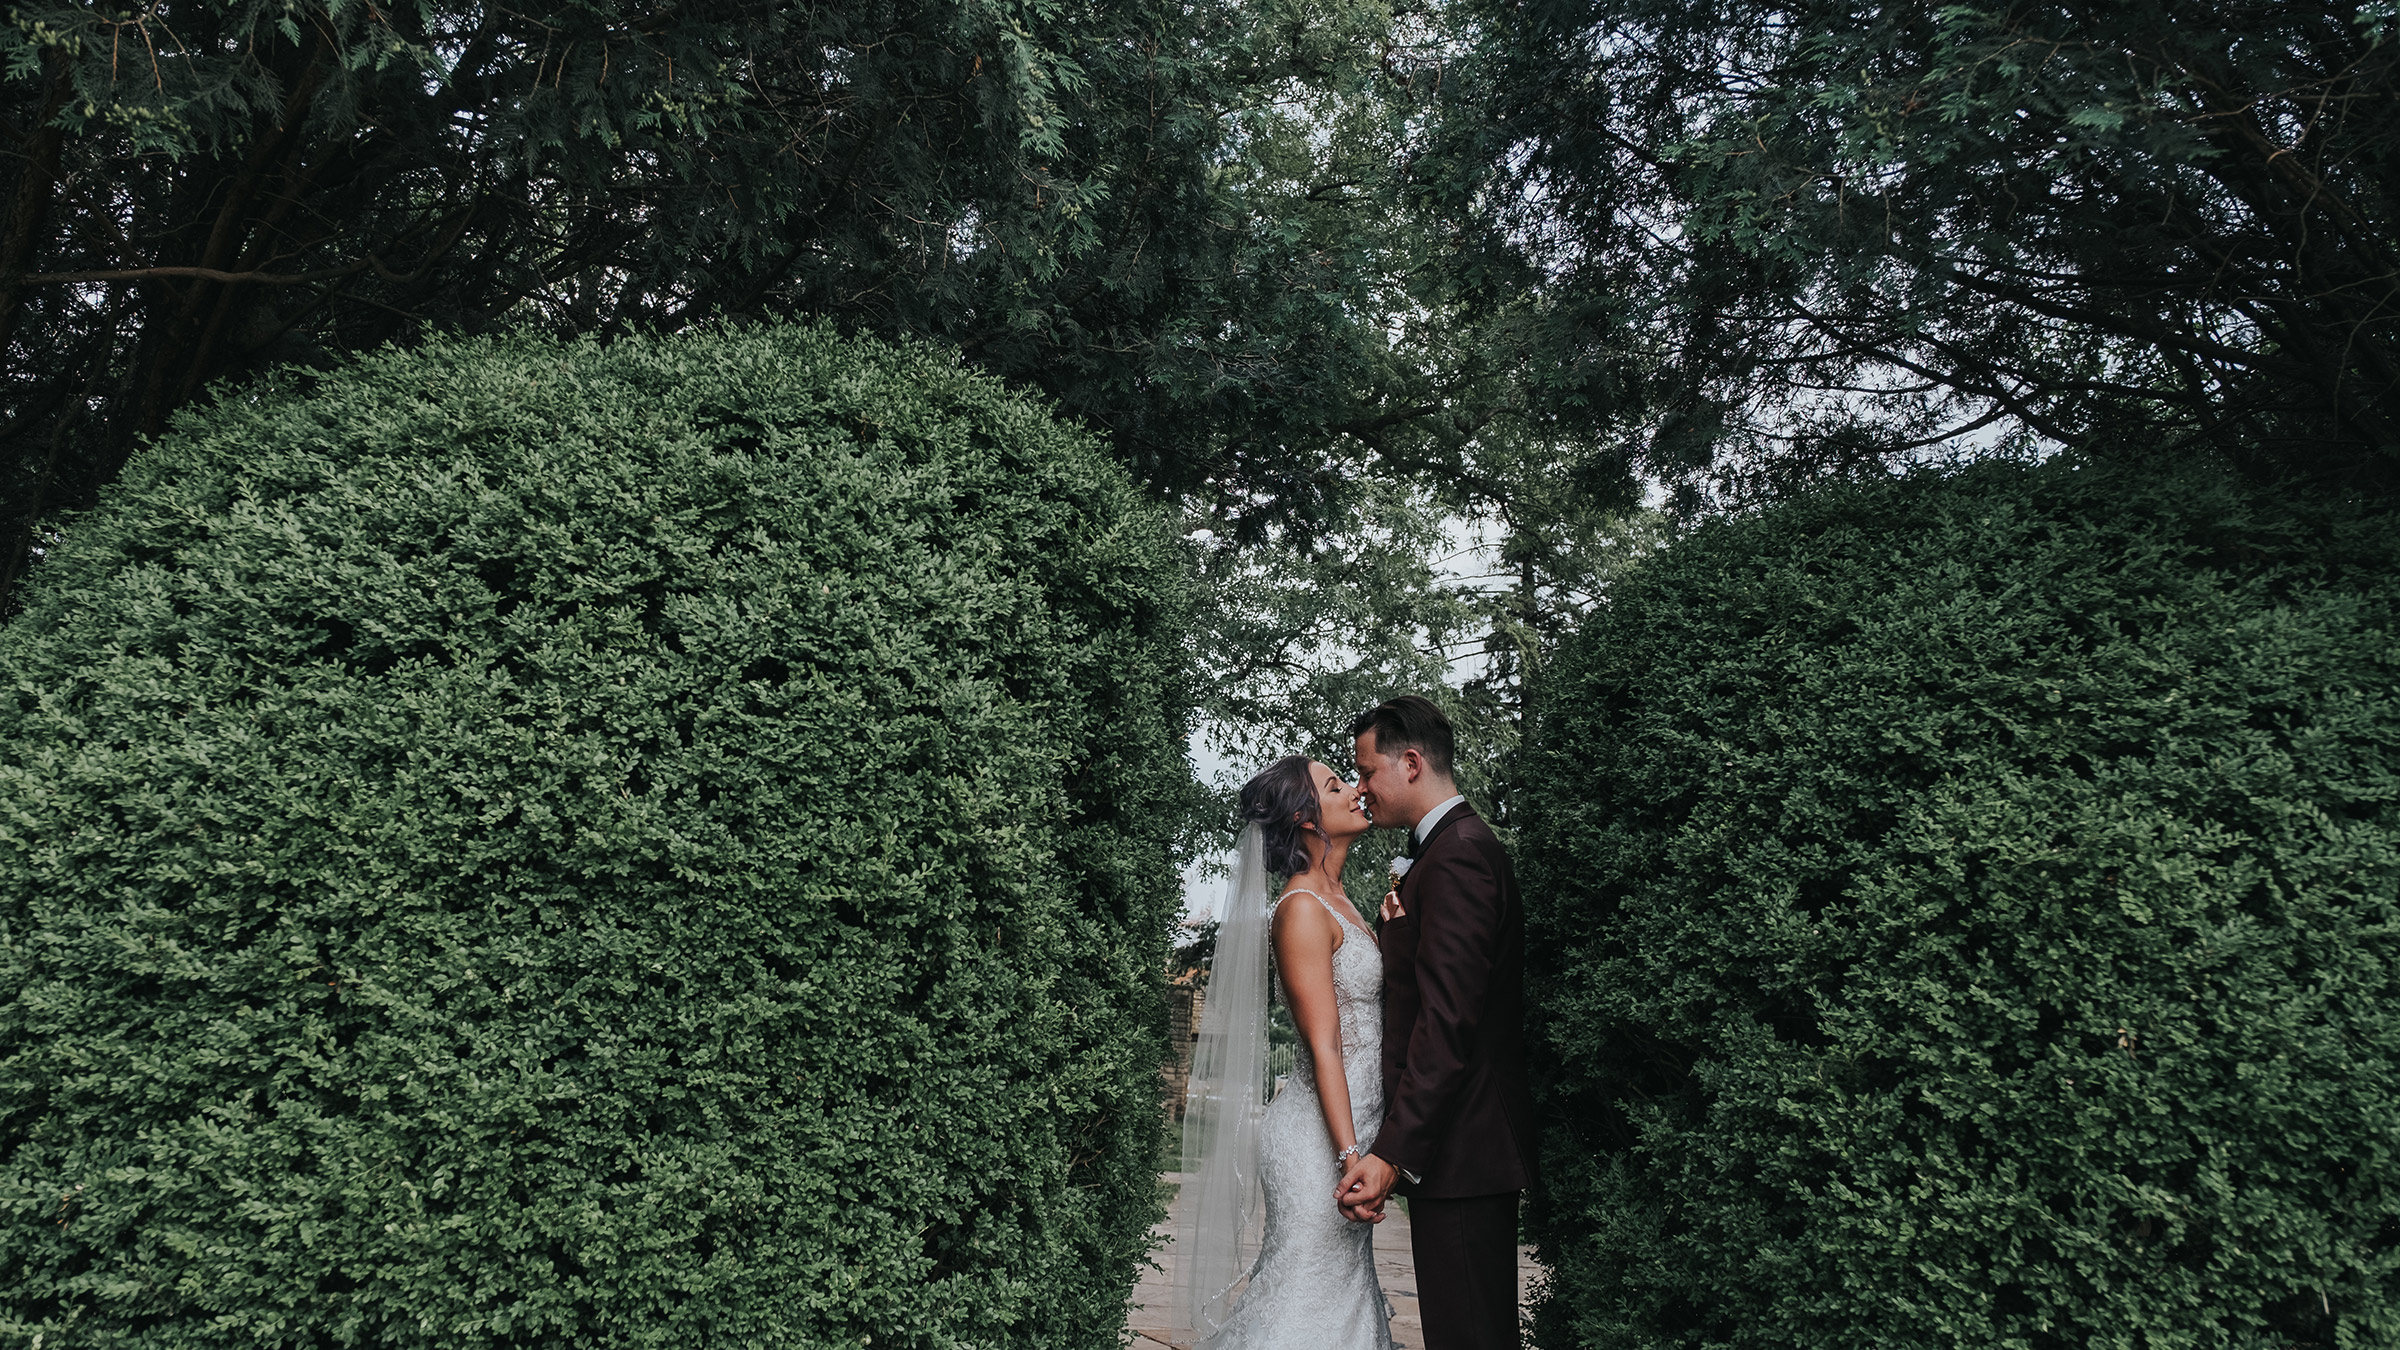 groom-kissing-bride-between-bushes-at-rose-garden-desmoines-iowa-art-center-raelyn-ramey-photography.jpg